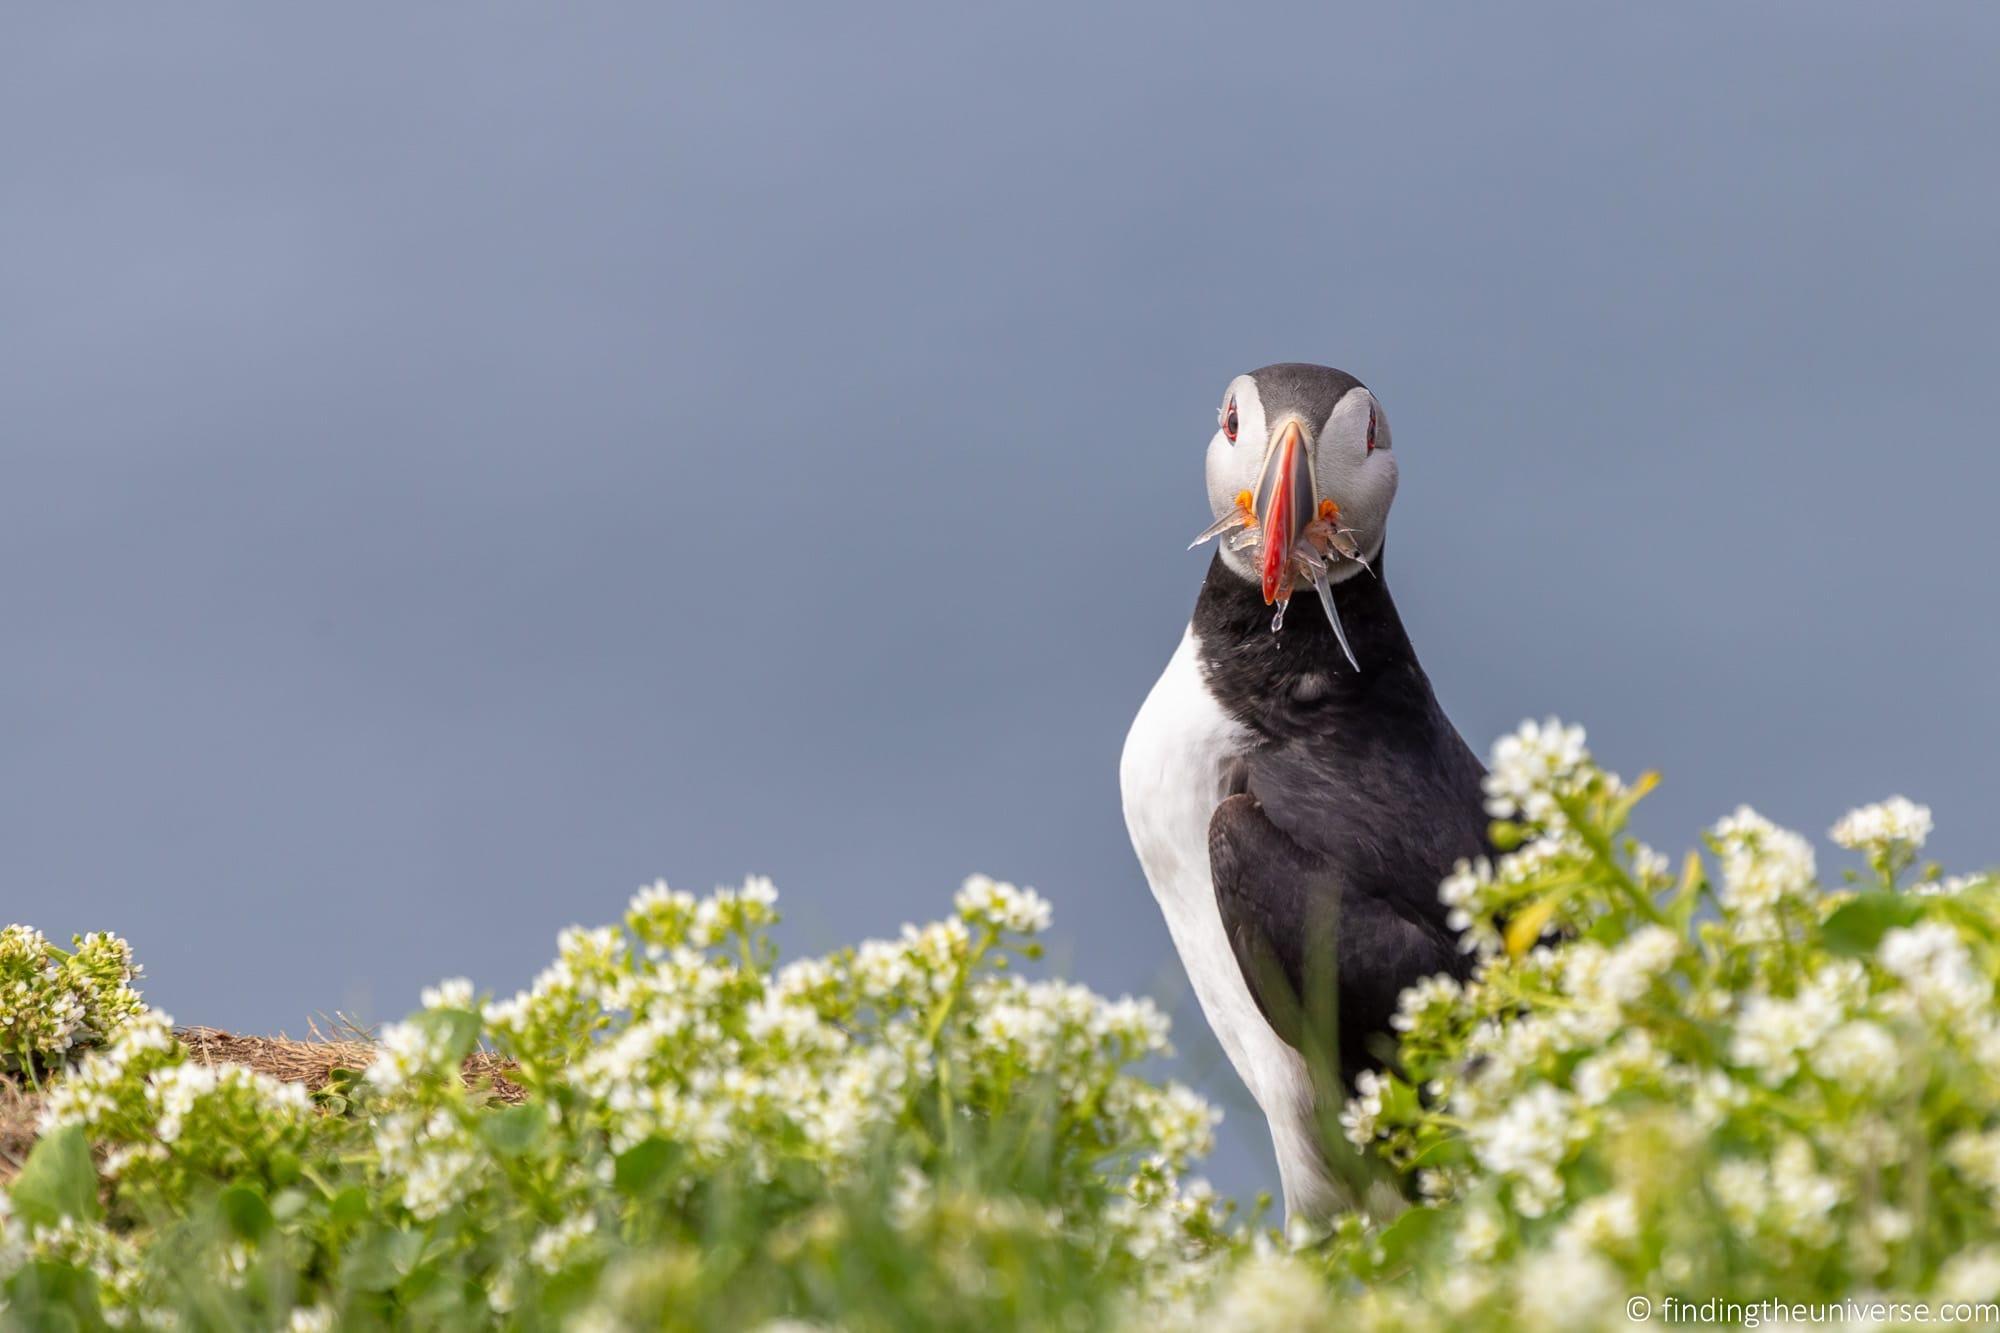 Birdwatching for beginners